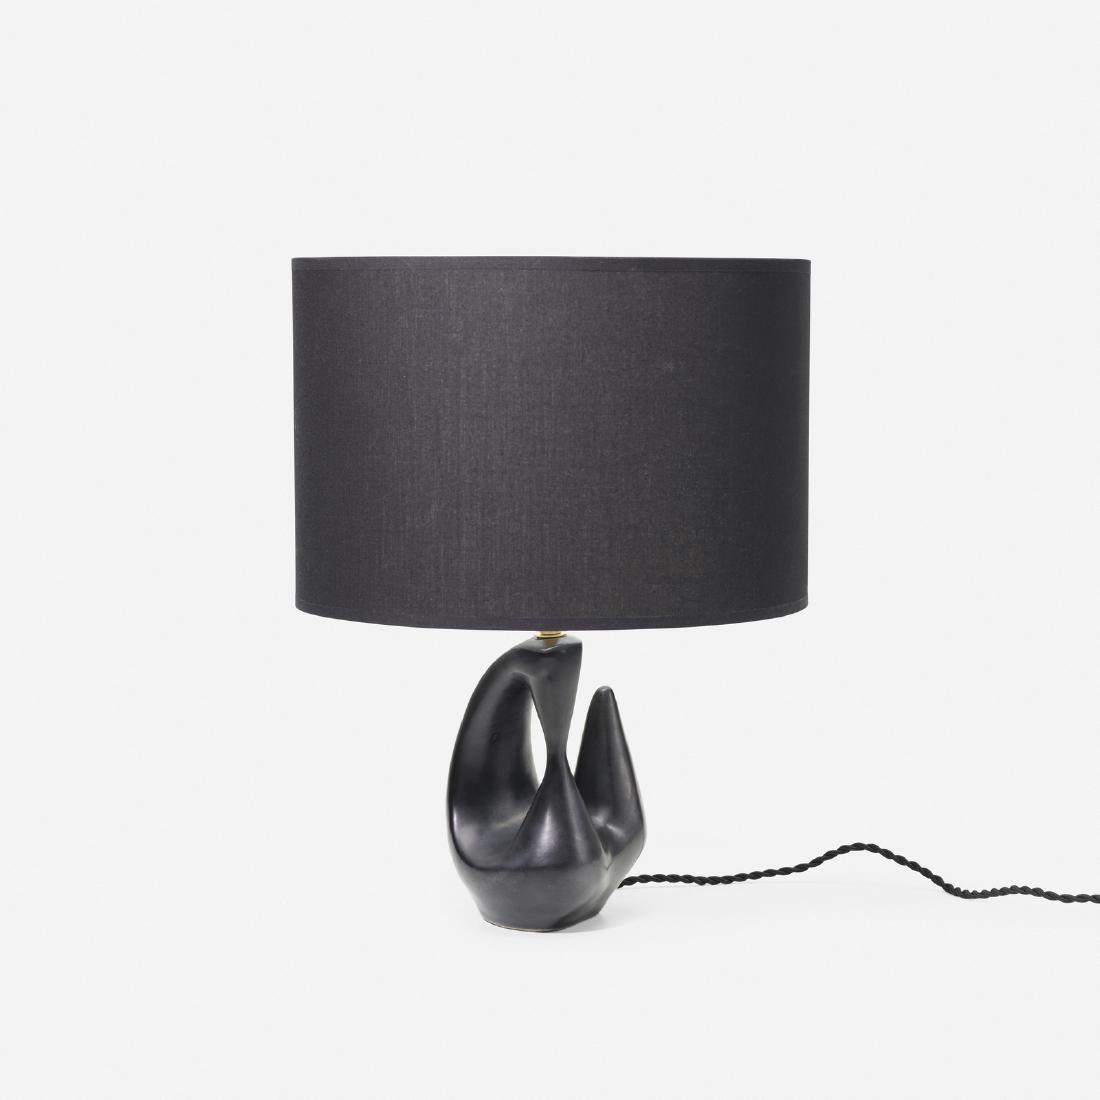 Georges Jouve, table lamp